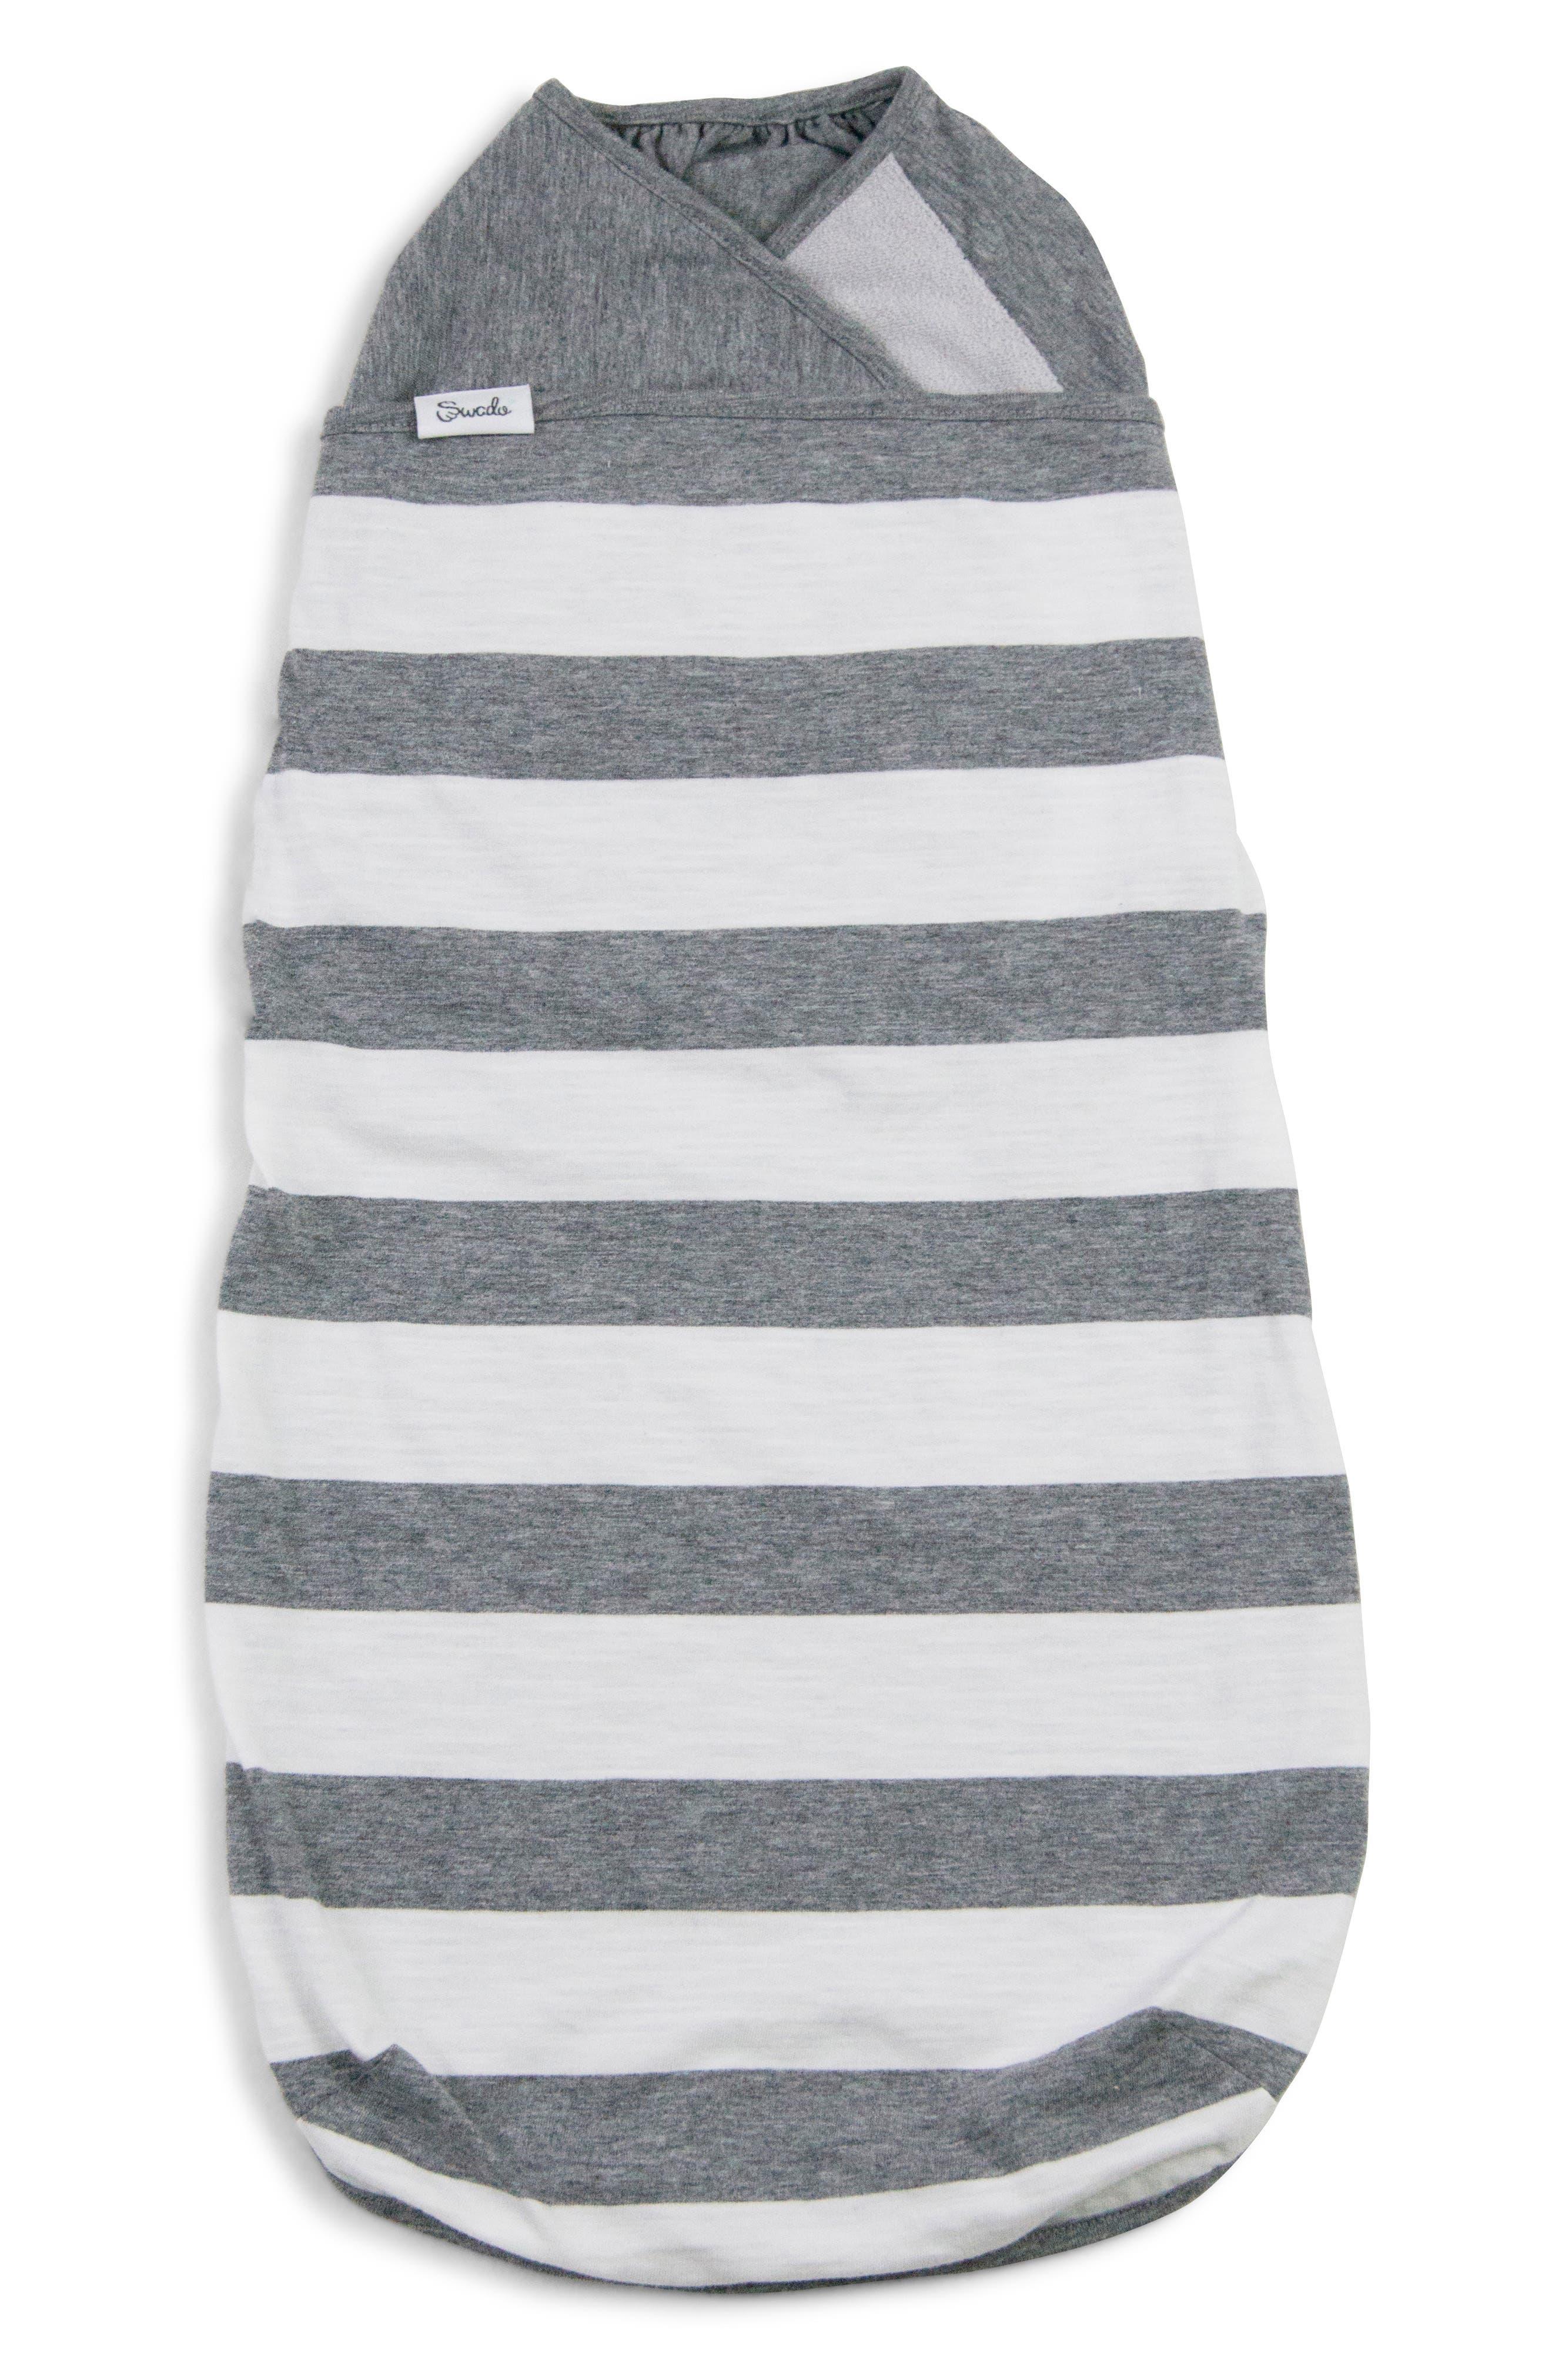 SWADO, Stripe Wearable Swaddle, Main thumbnail 1, color, GREY/ WHITE STRIPE